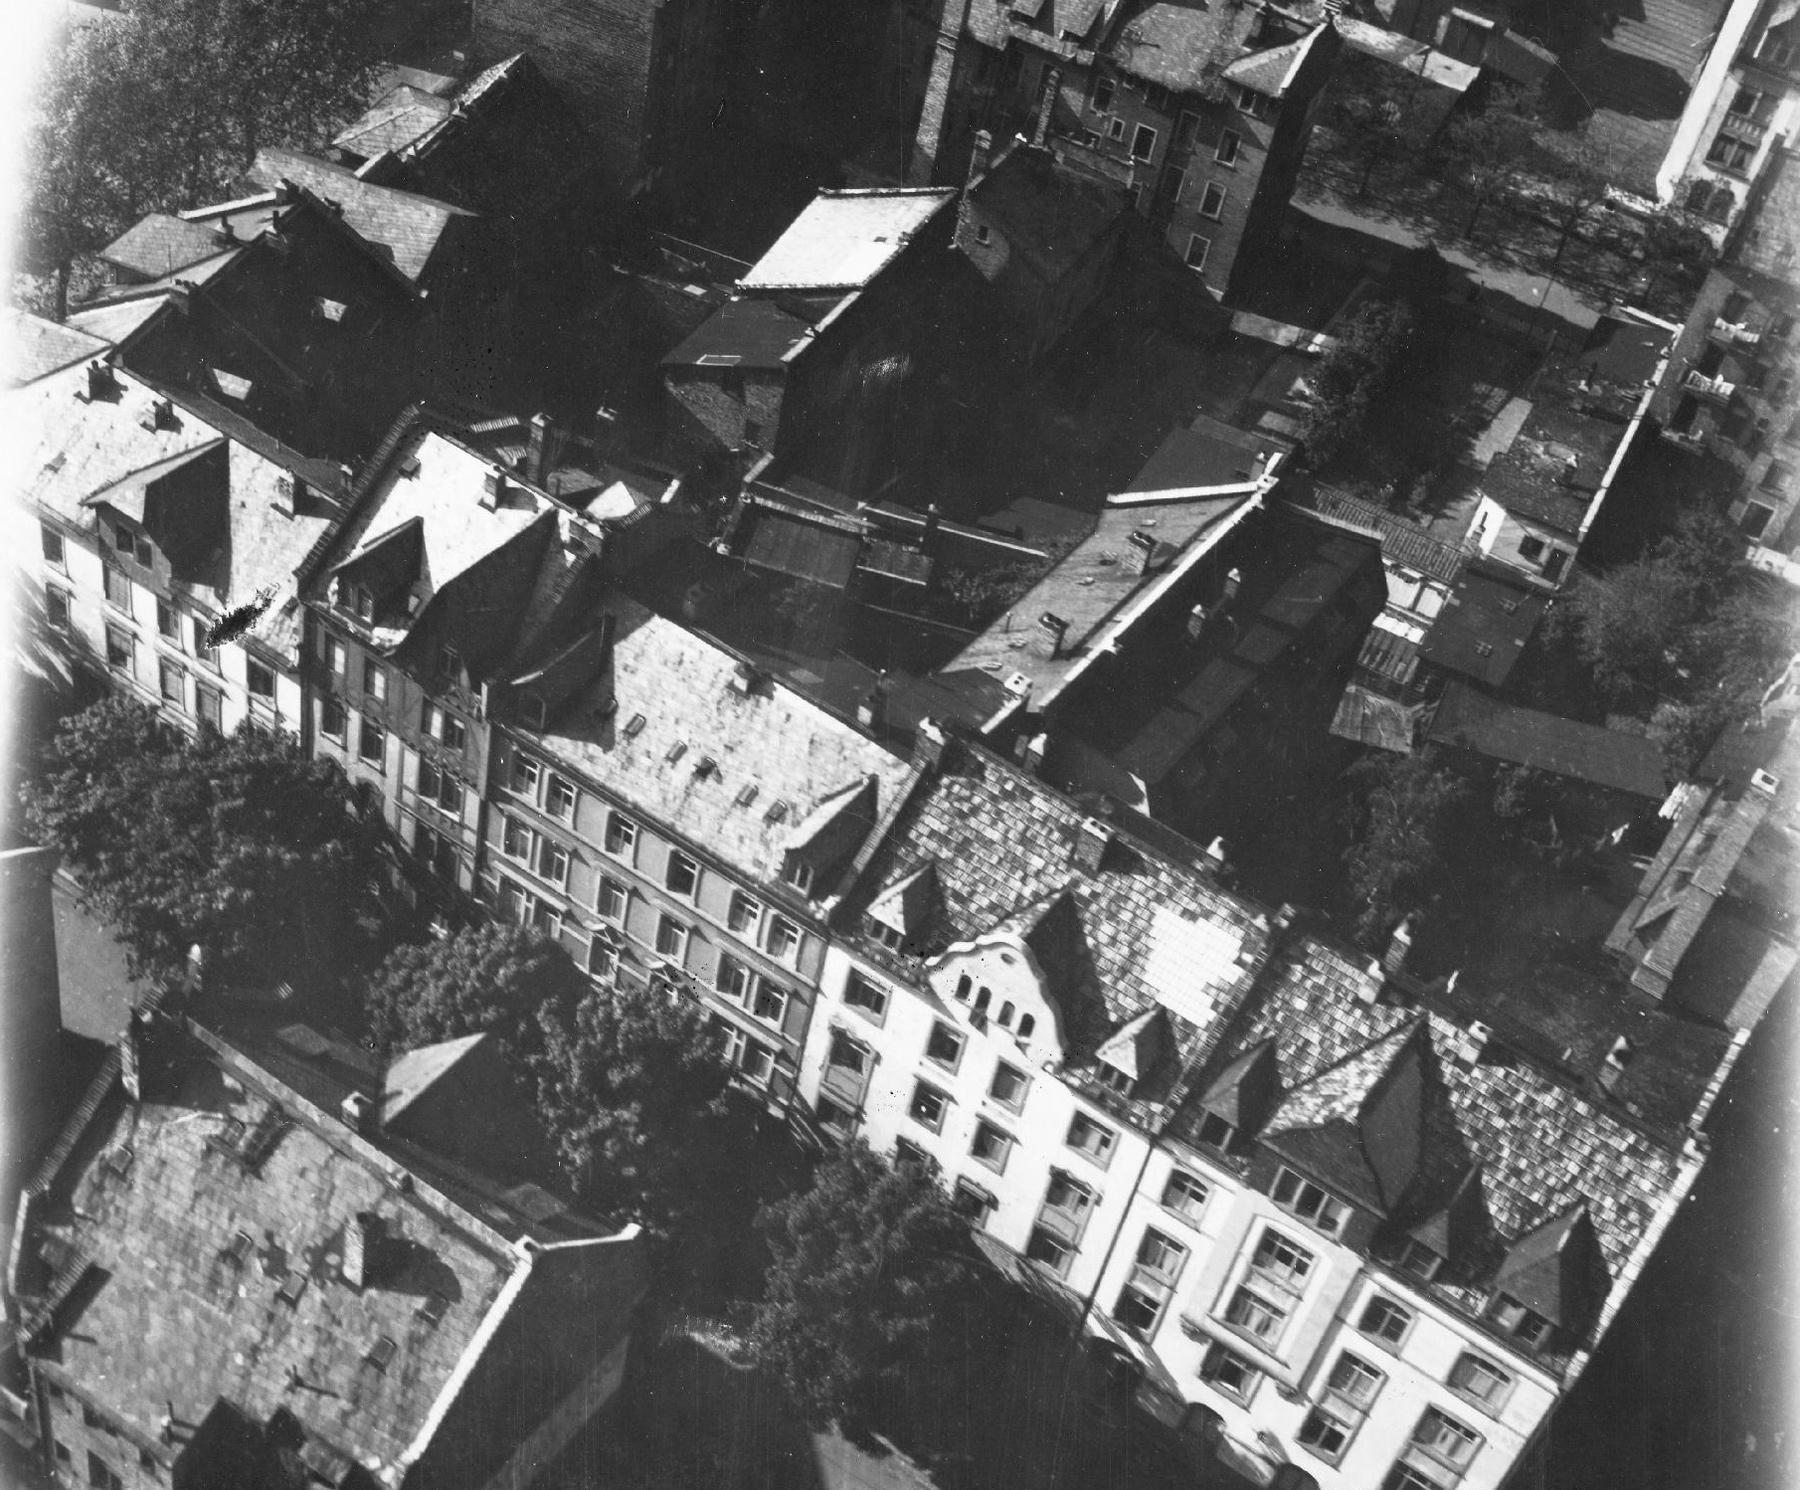 Offenbach am Main - Luftaufnahme der Querstraße aus dem Mai 1945